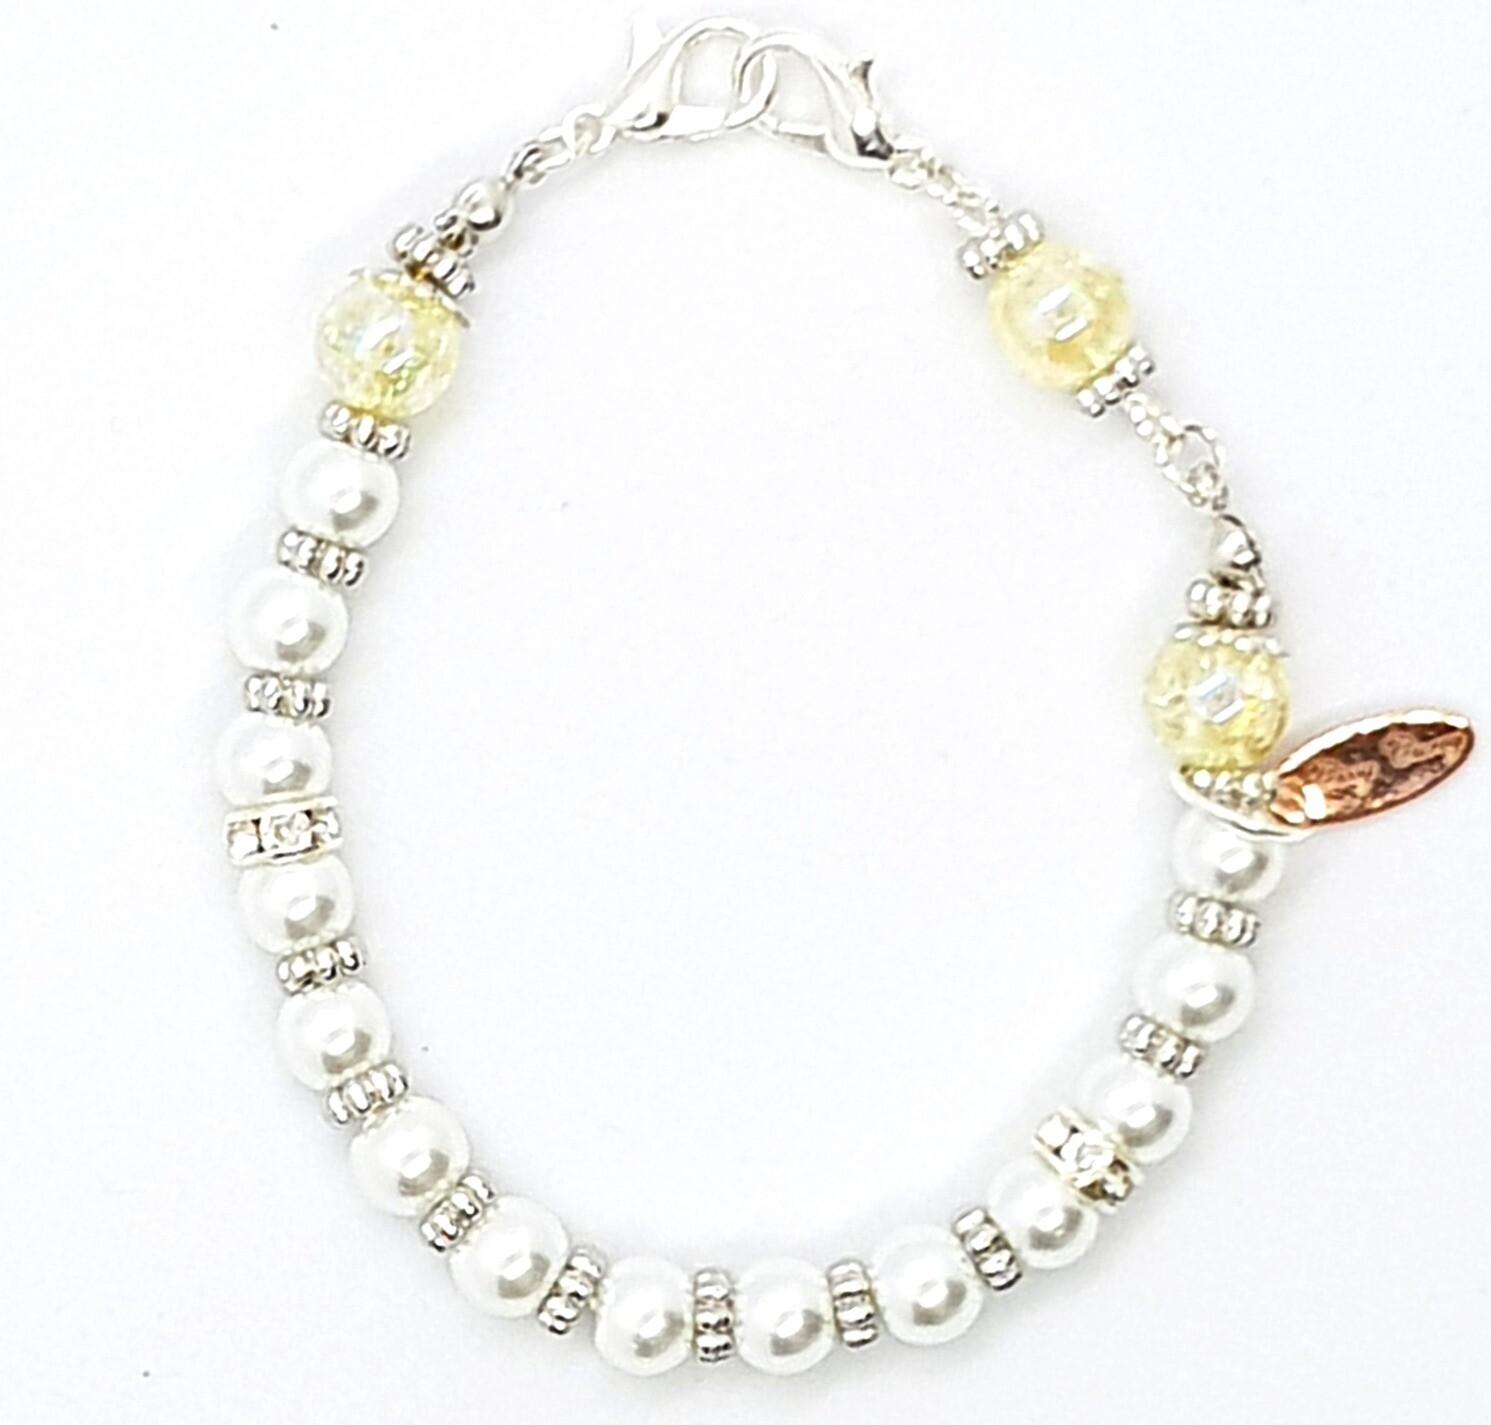 Bracelet & Face Mask Extender Dual Function (Sonata - Pearl Beads)